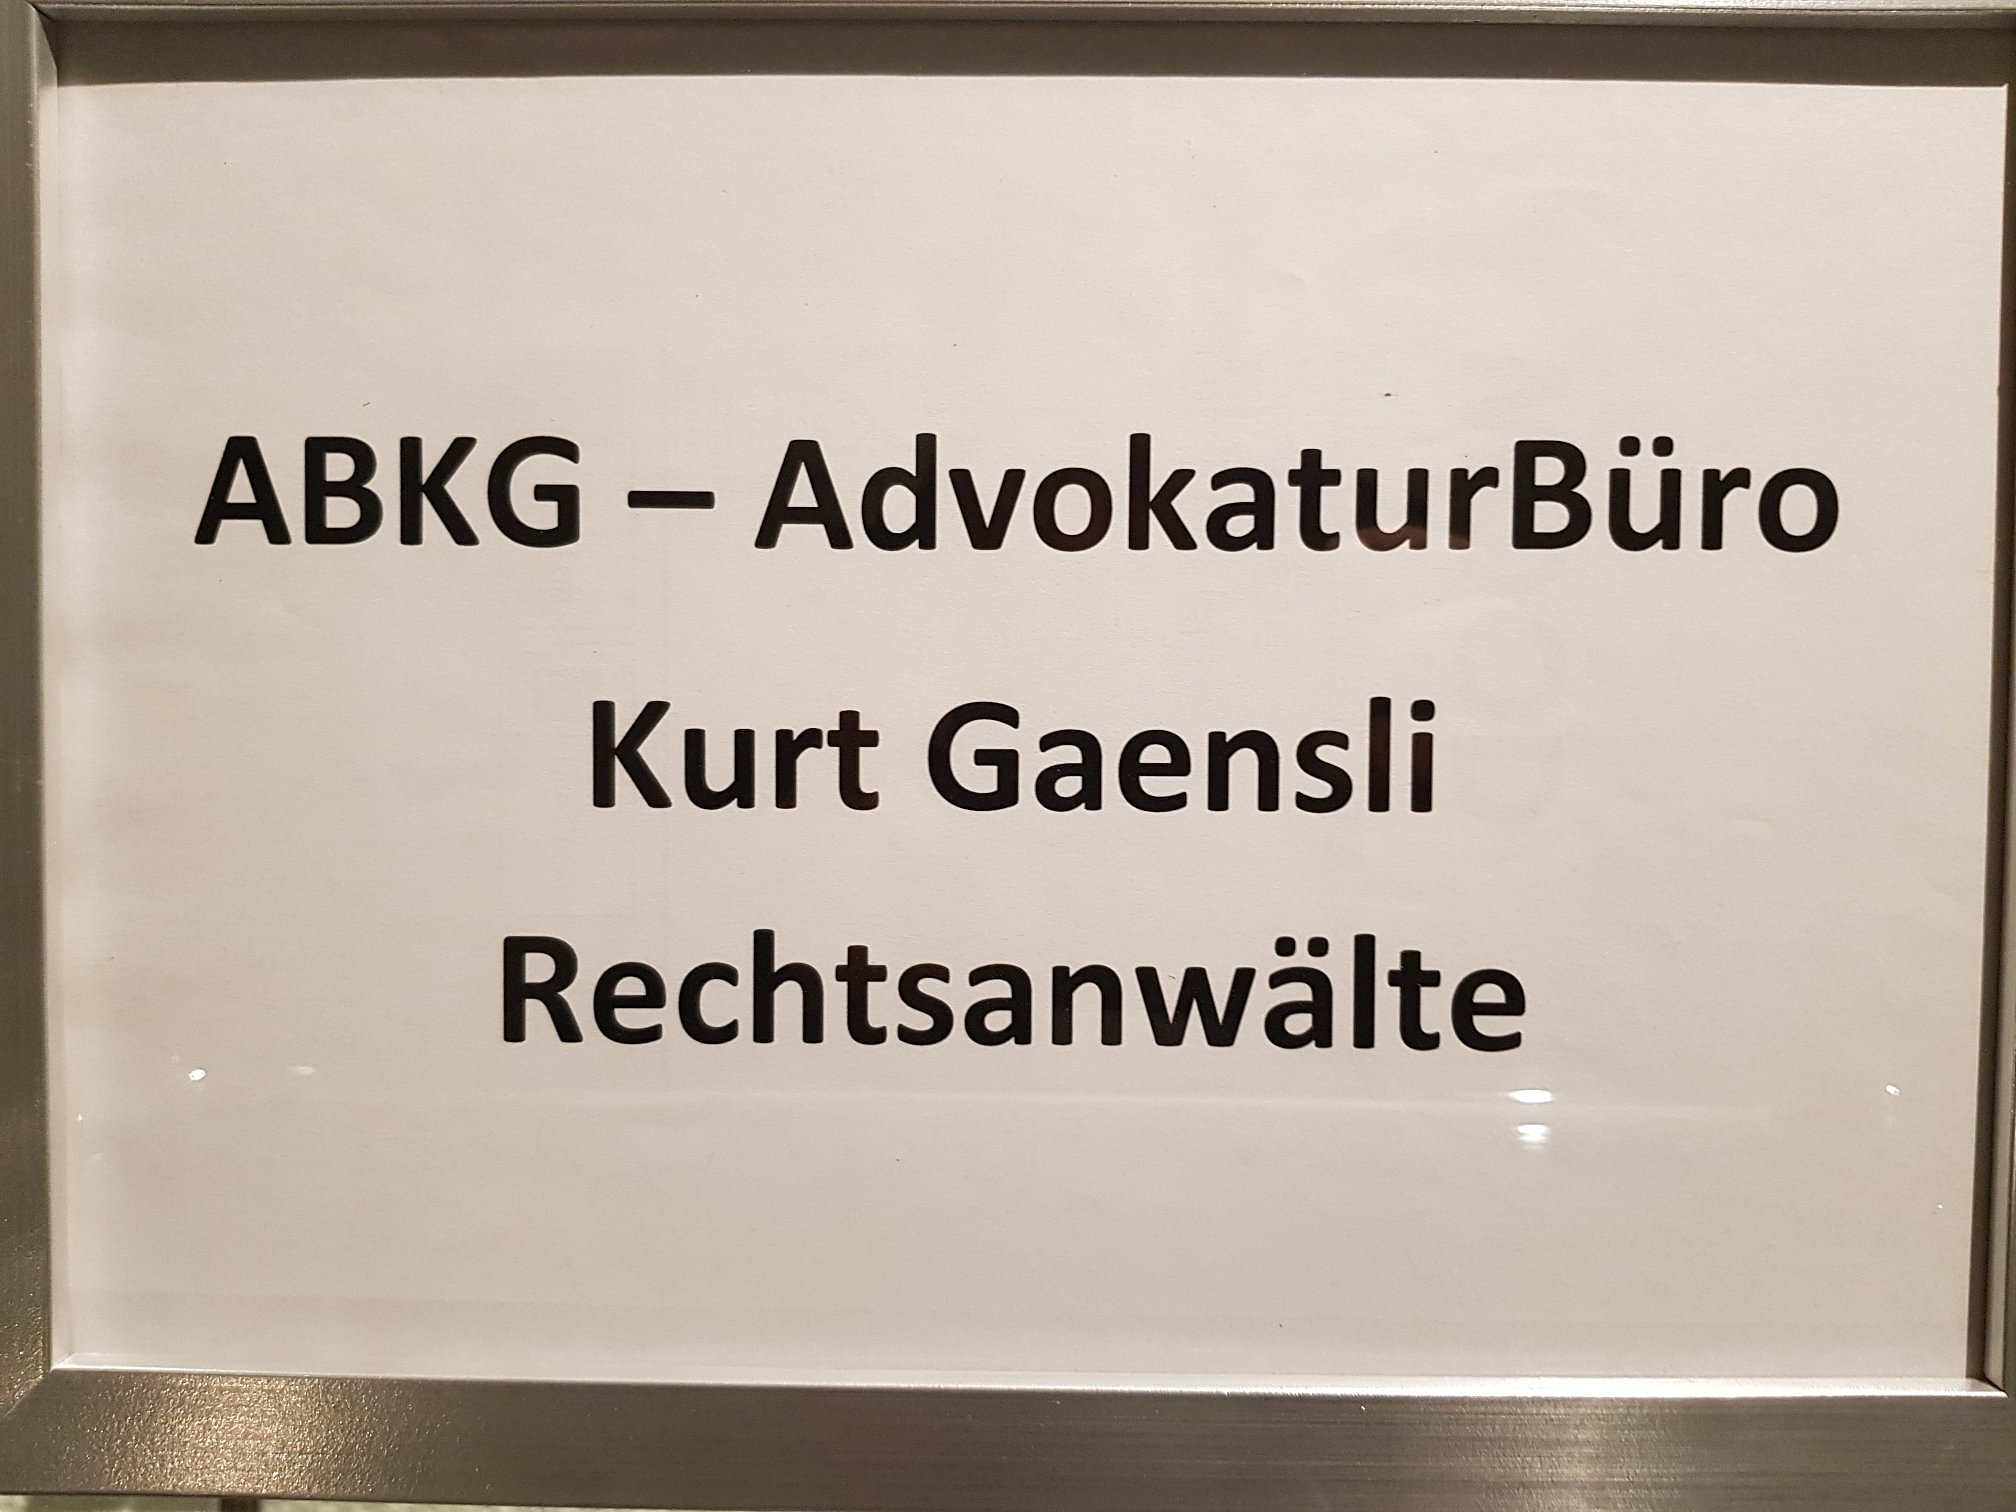 ABKG - AdvokaturBüro Kurt Gaensli